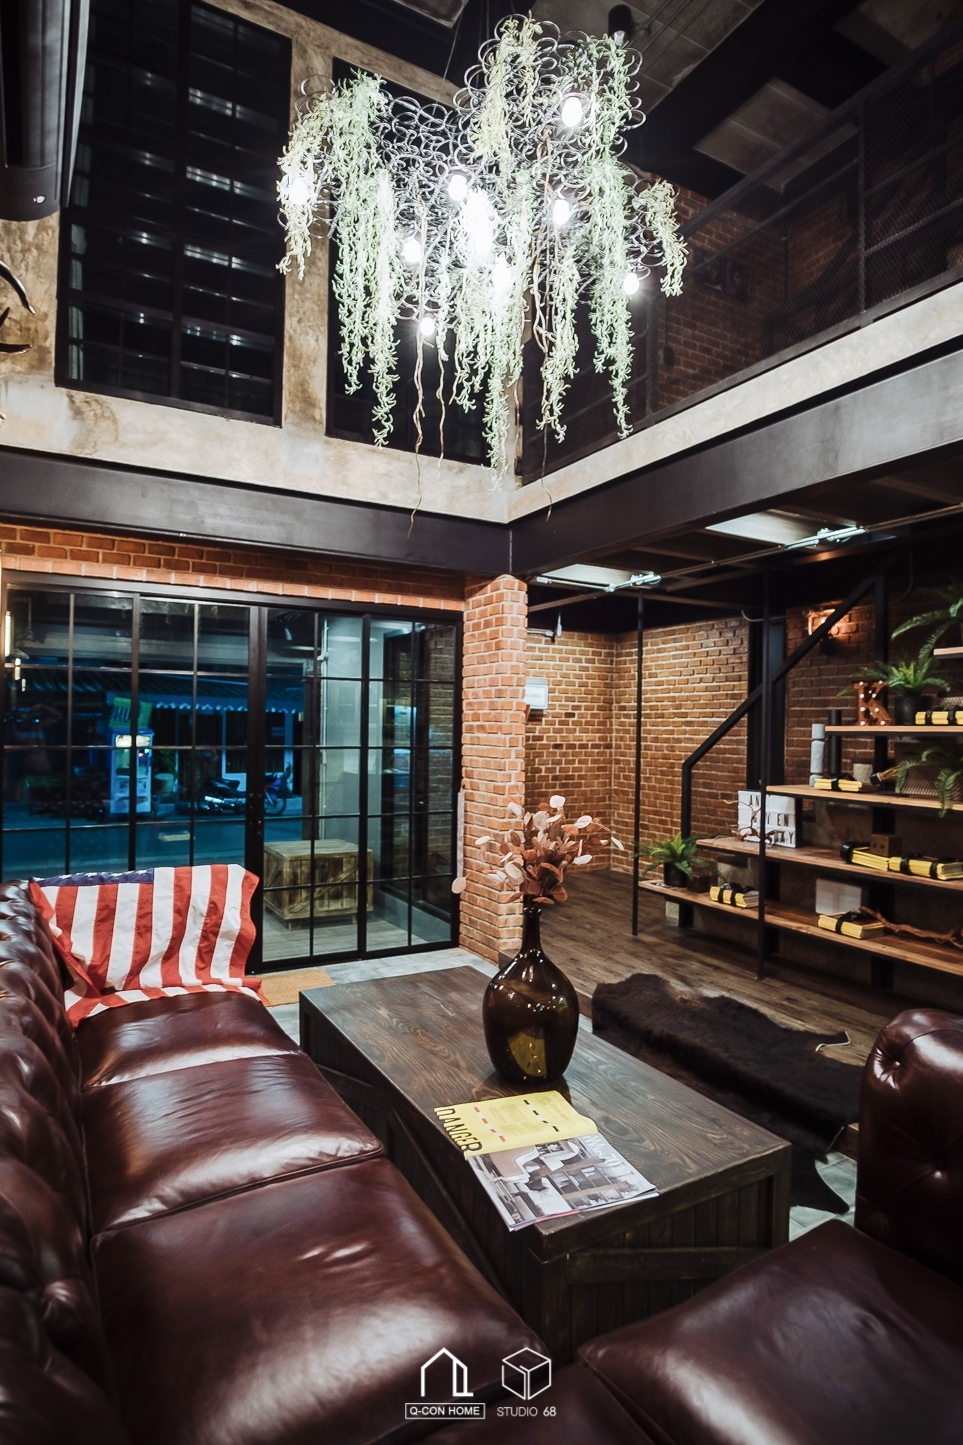 Pool Villa HuaHin, ที่พักพูลวิลล่าหัวหิน, ออกแบบโรงแรมสไตล์ Loft industrial, ออกแบบโรงแรม, รับสร้างโรงแรม, ห้องนั่งเล่นสไตล์ loft